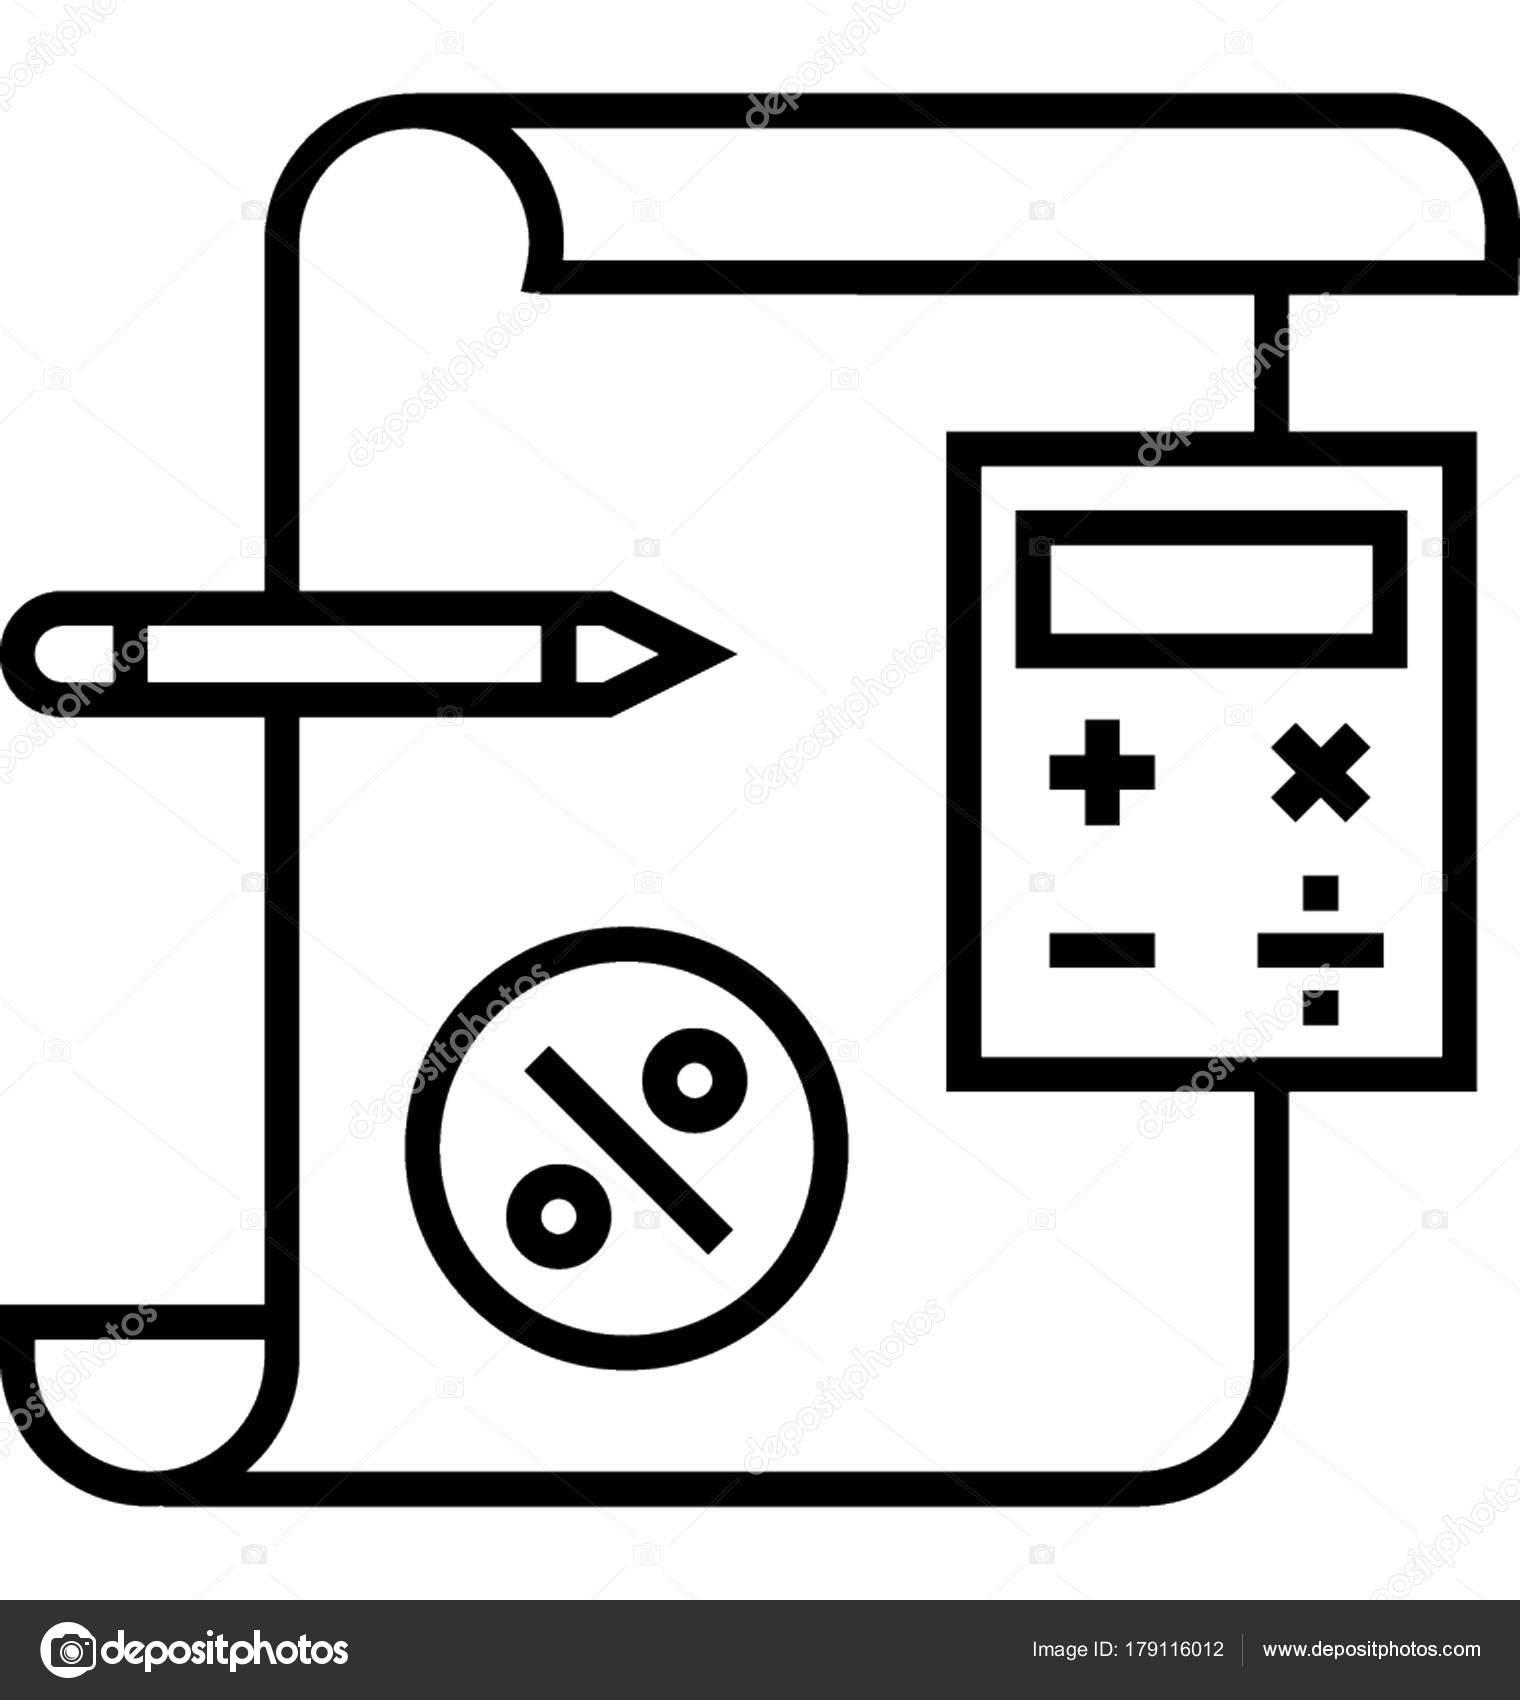 buchhaltung linie vektor icon stockvektor. Black Bedroom Furniture Sets. Home Design Ideas